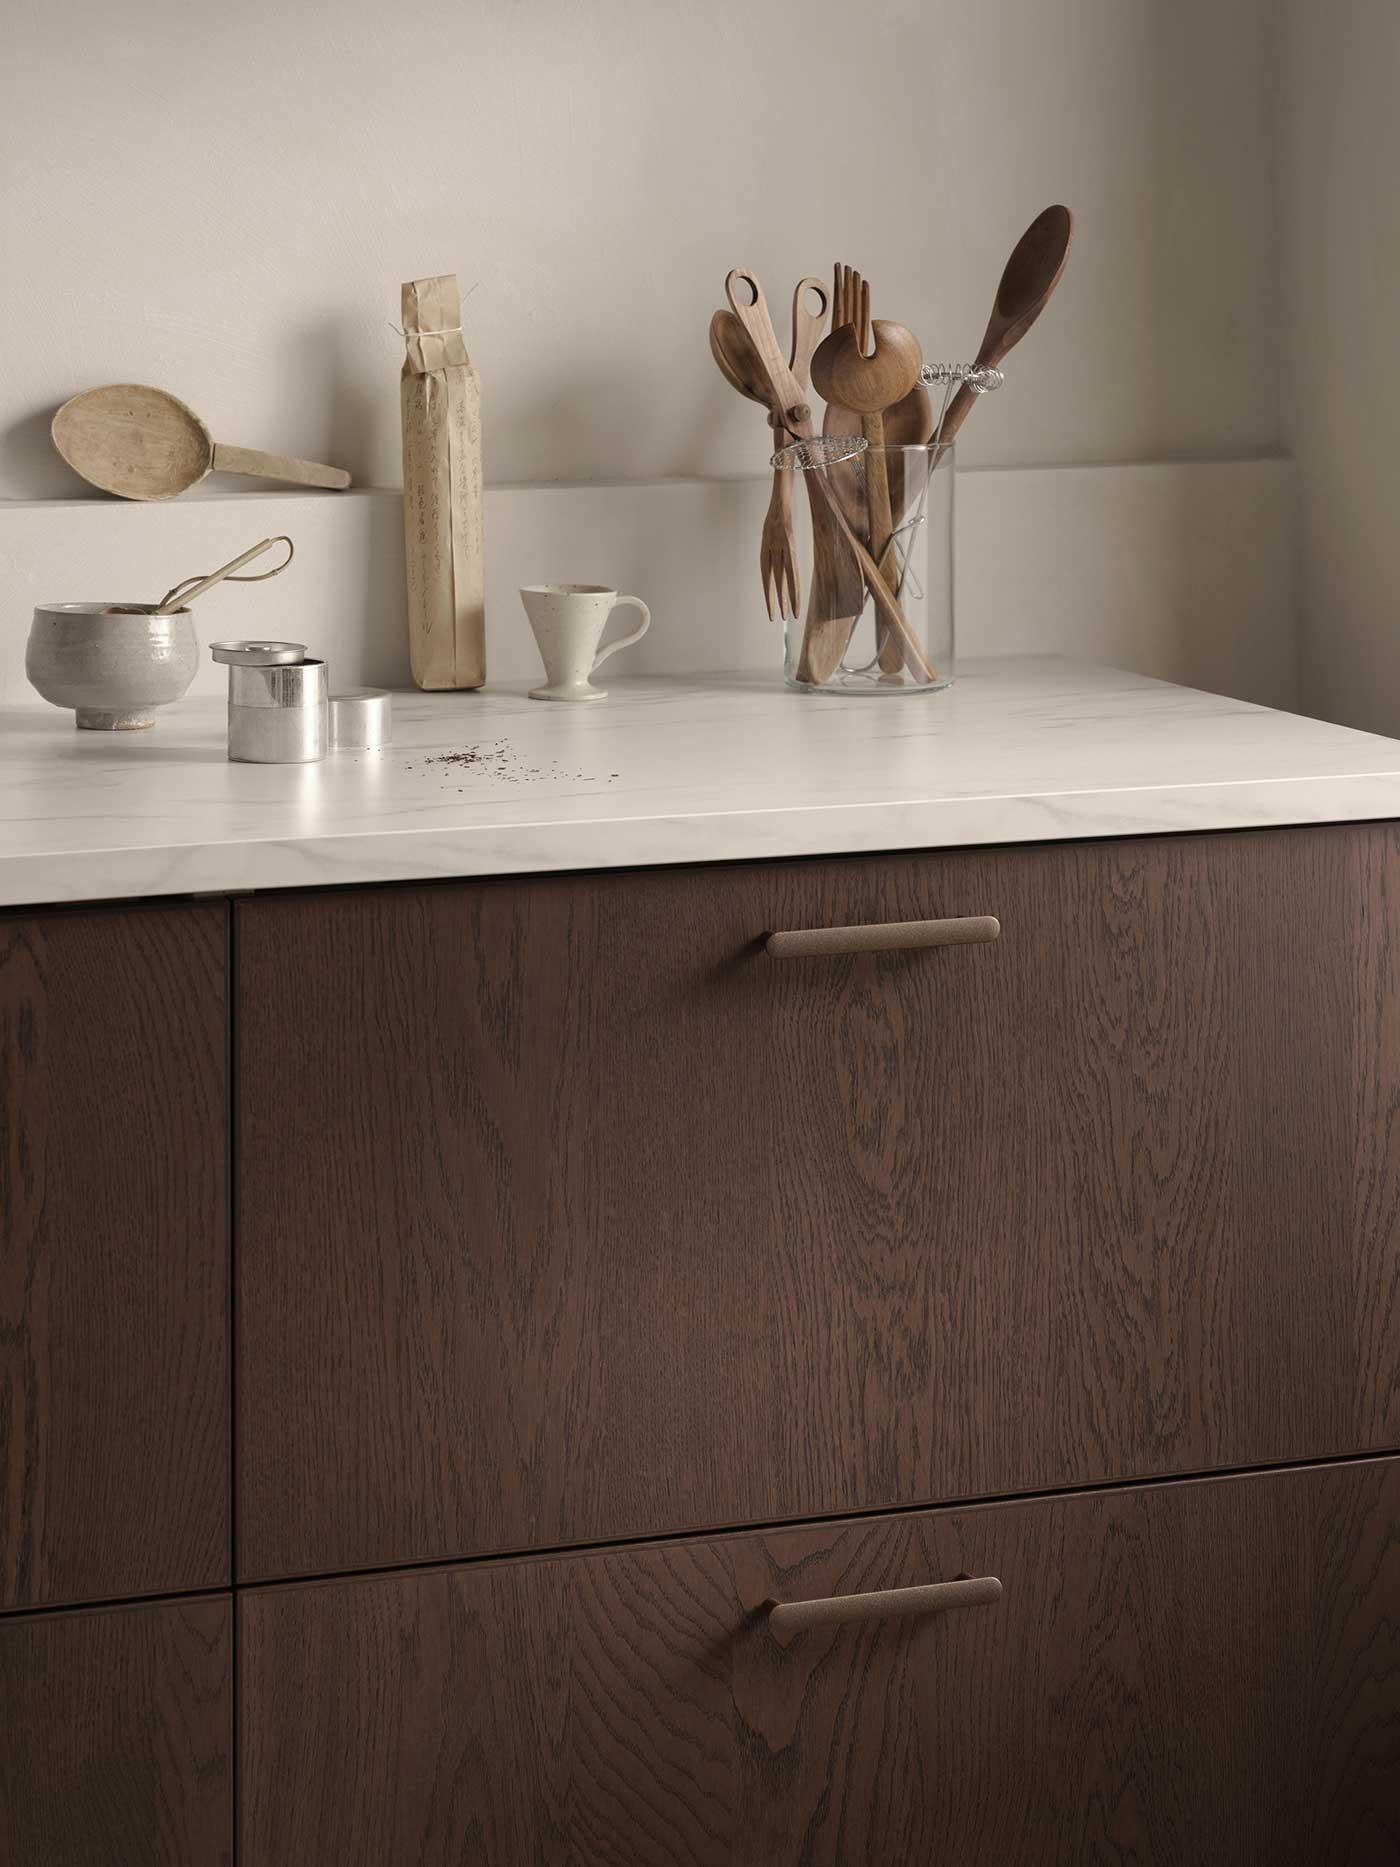 Küchenfronten dunkelbraun IKEA